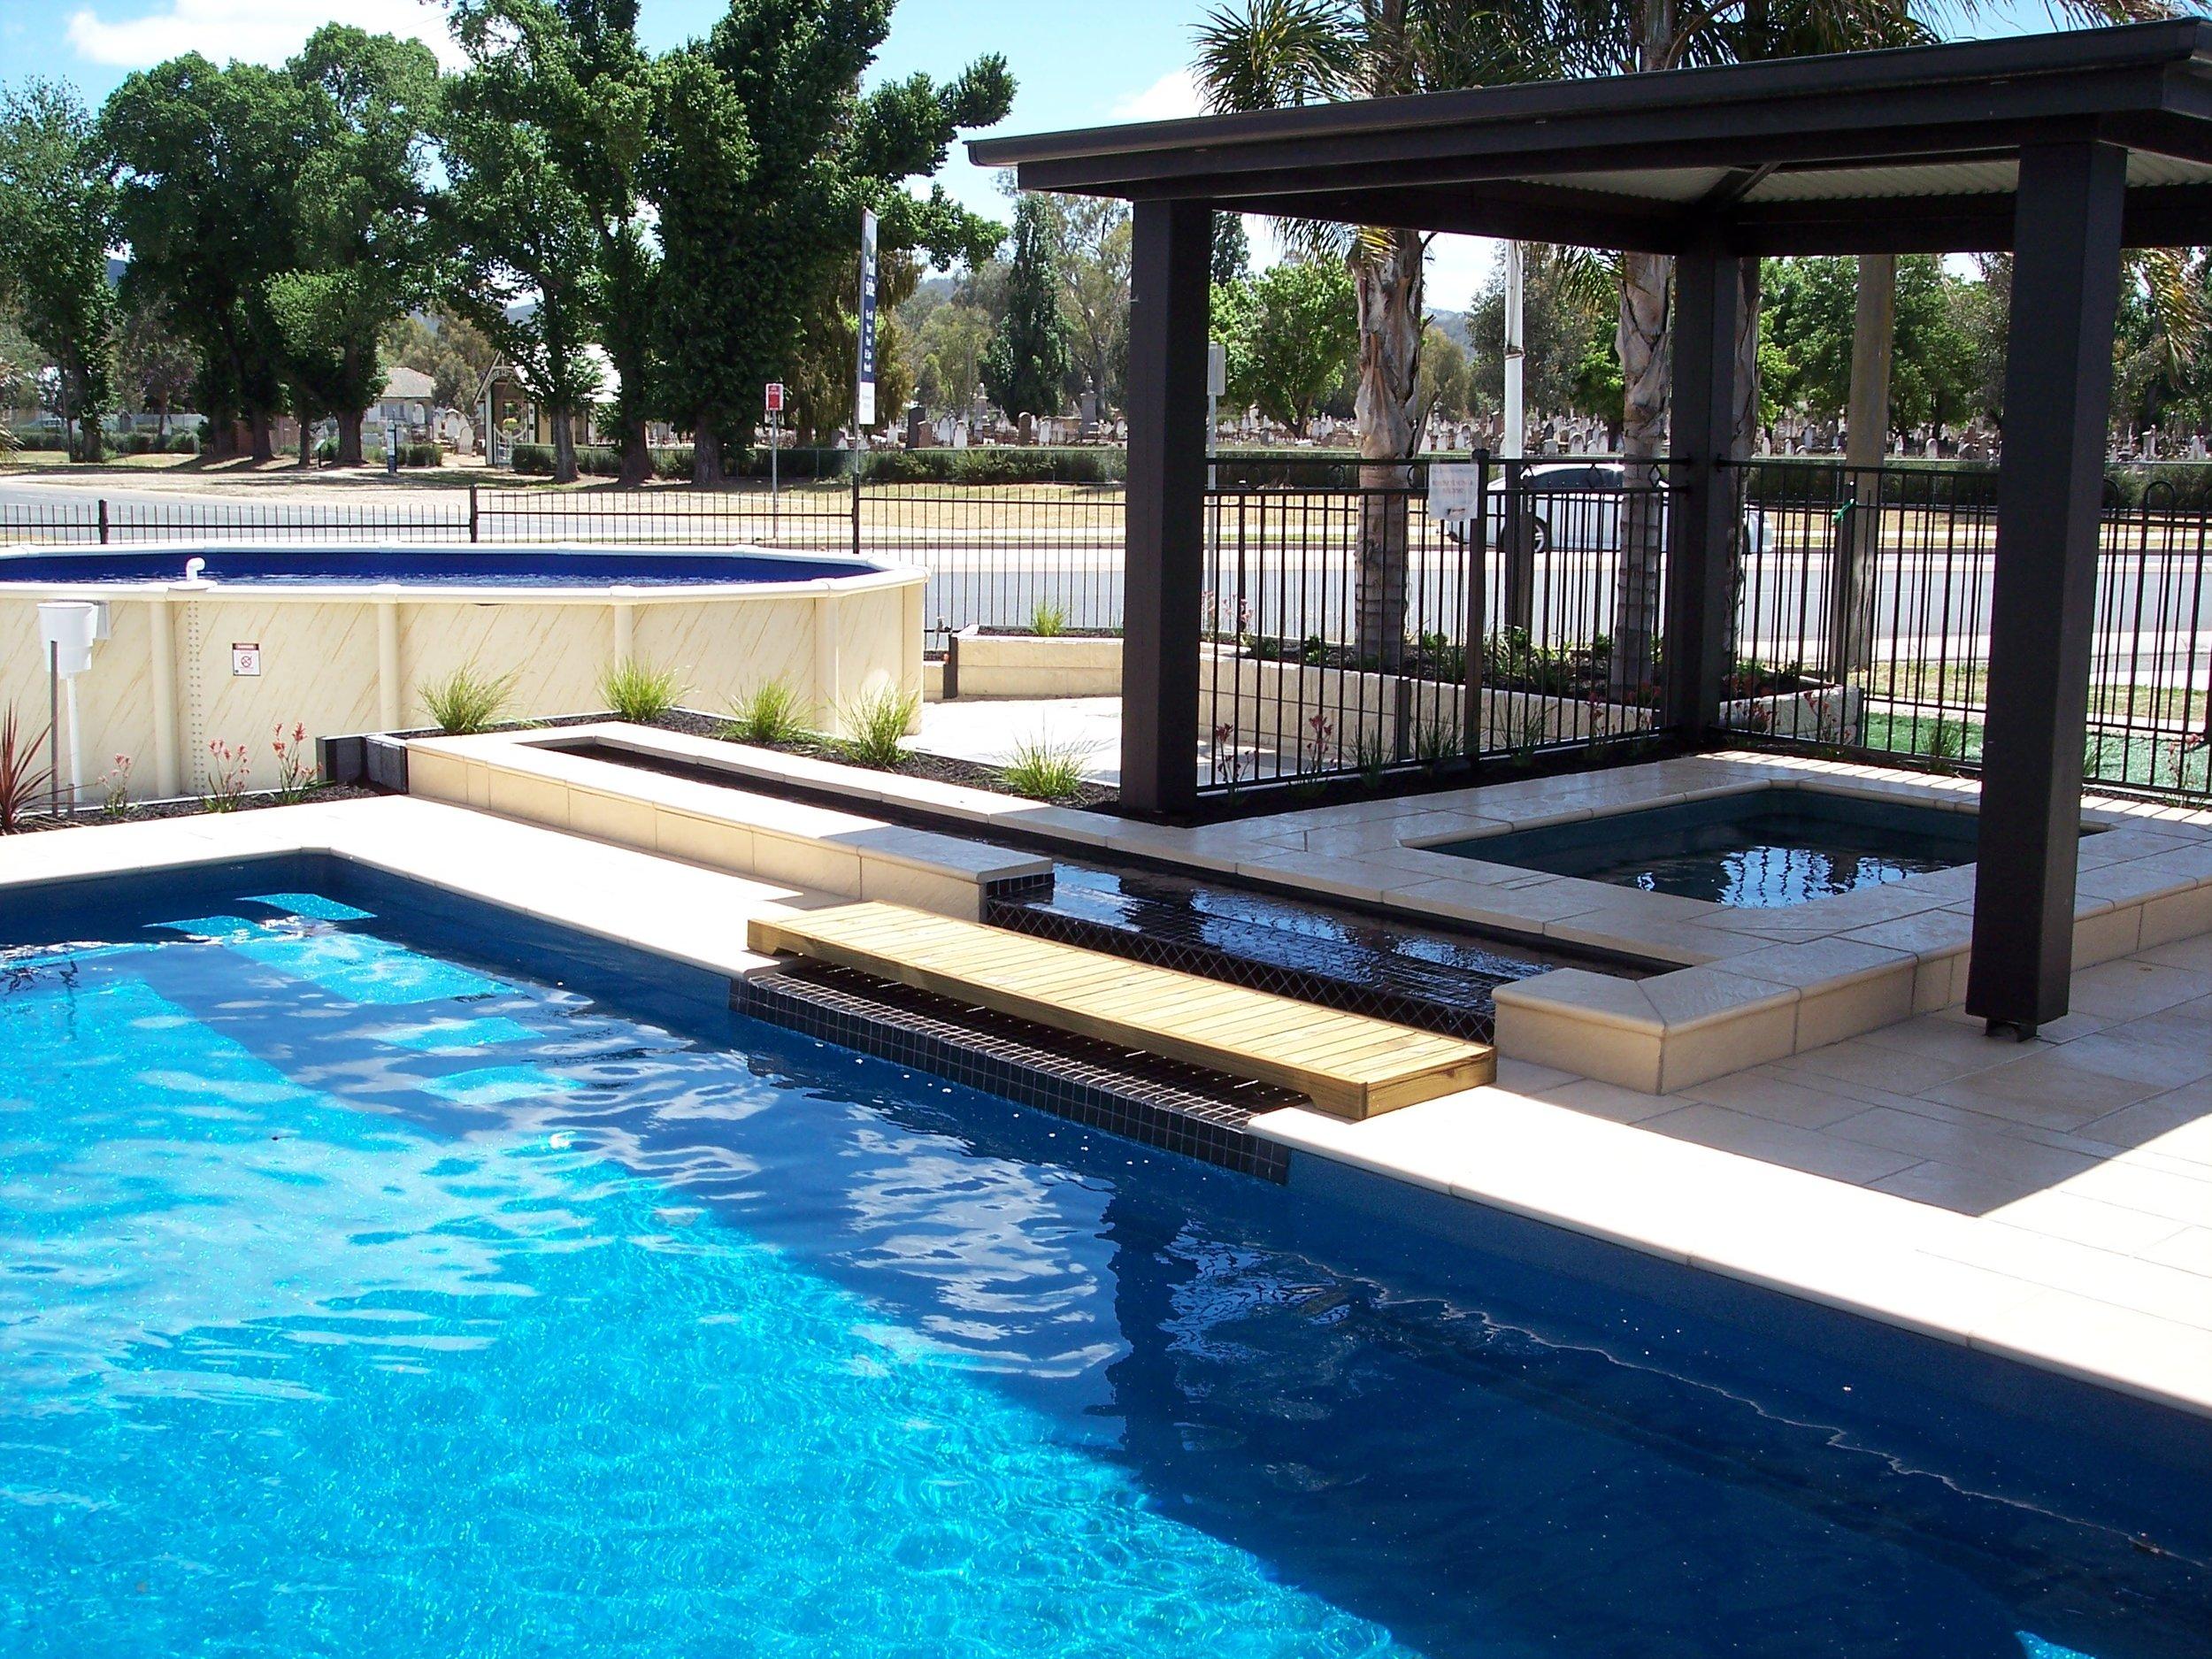 profile-pools-landscaping_4e2f7ba24f.jpg